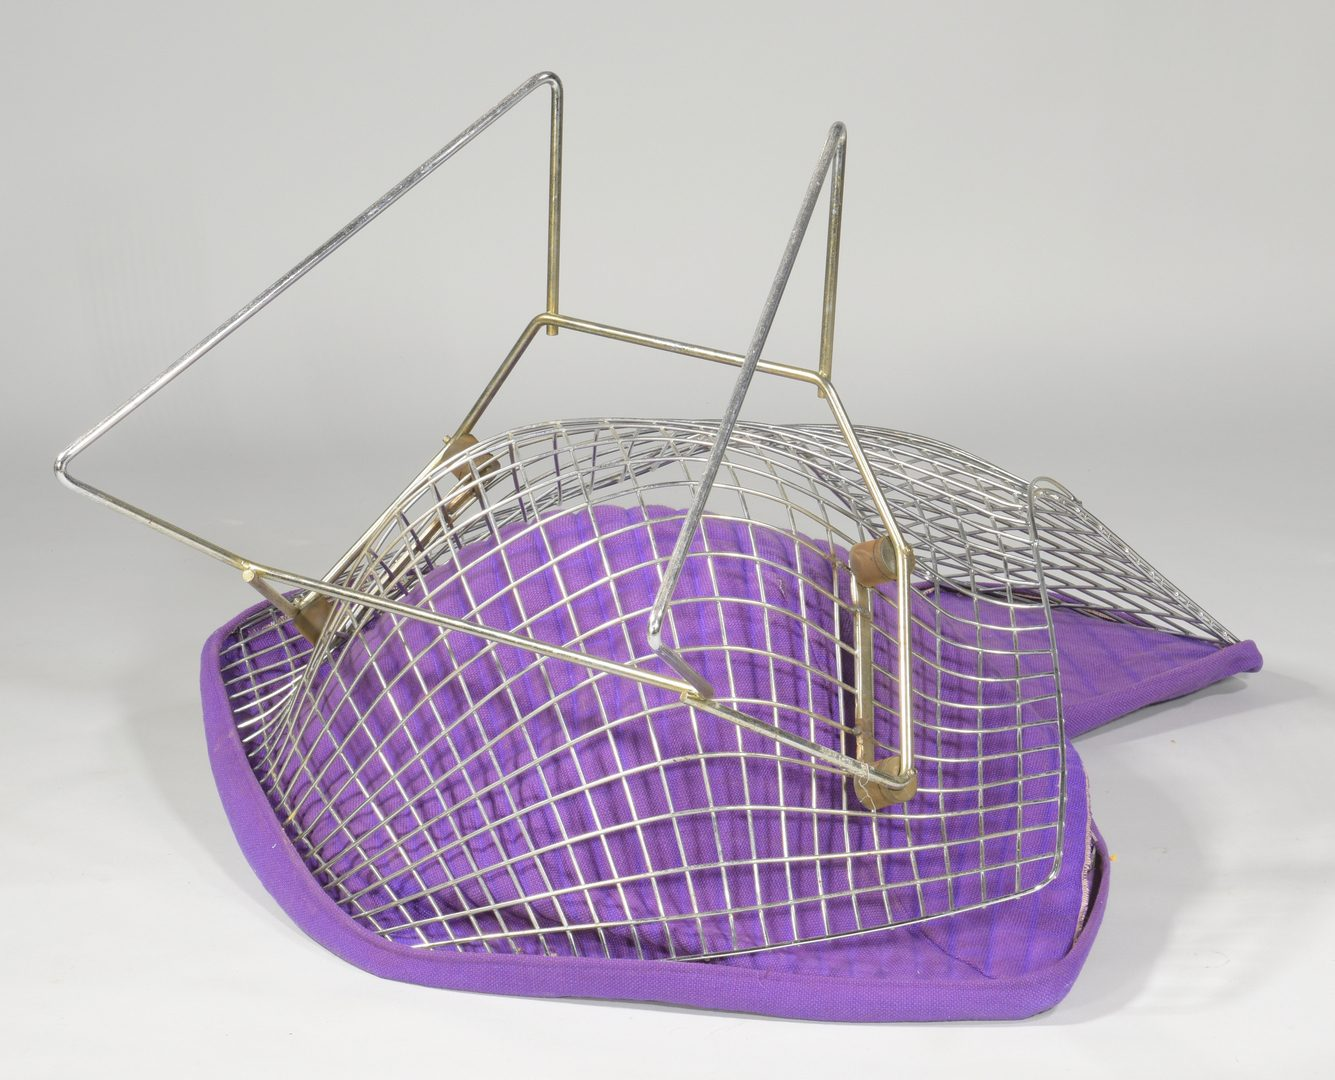 Lot 487: Harry Bertoia Knoll Bird Chair, labeled